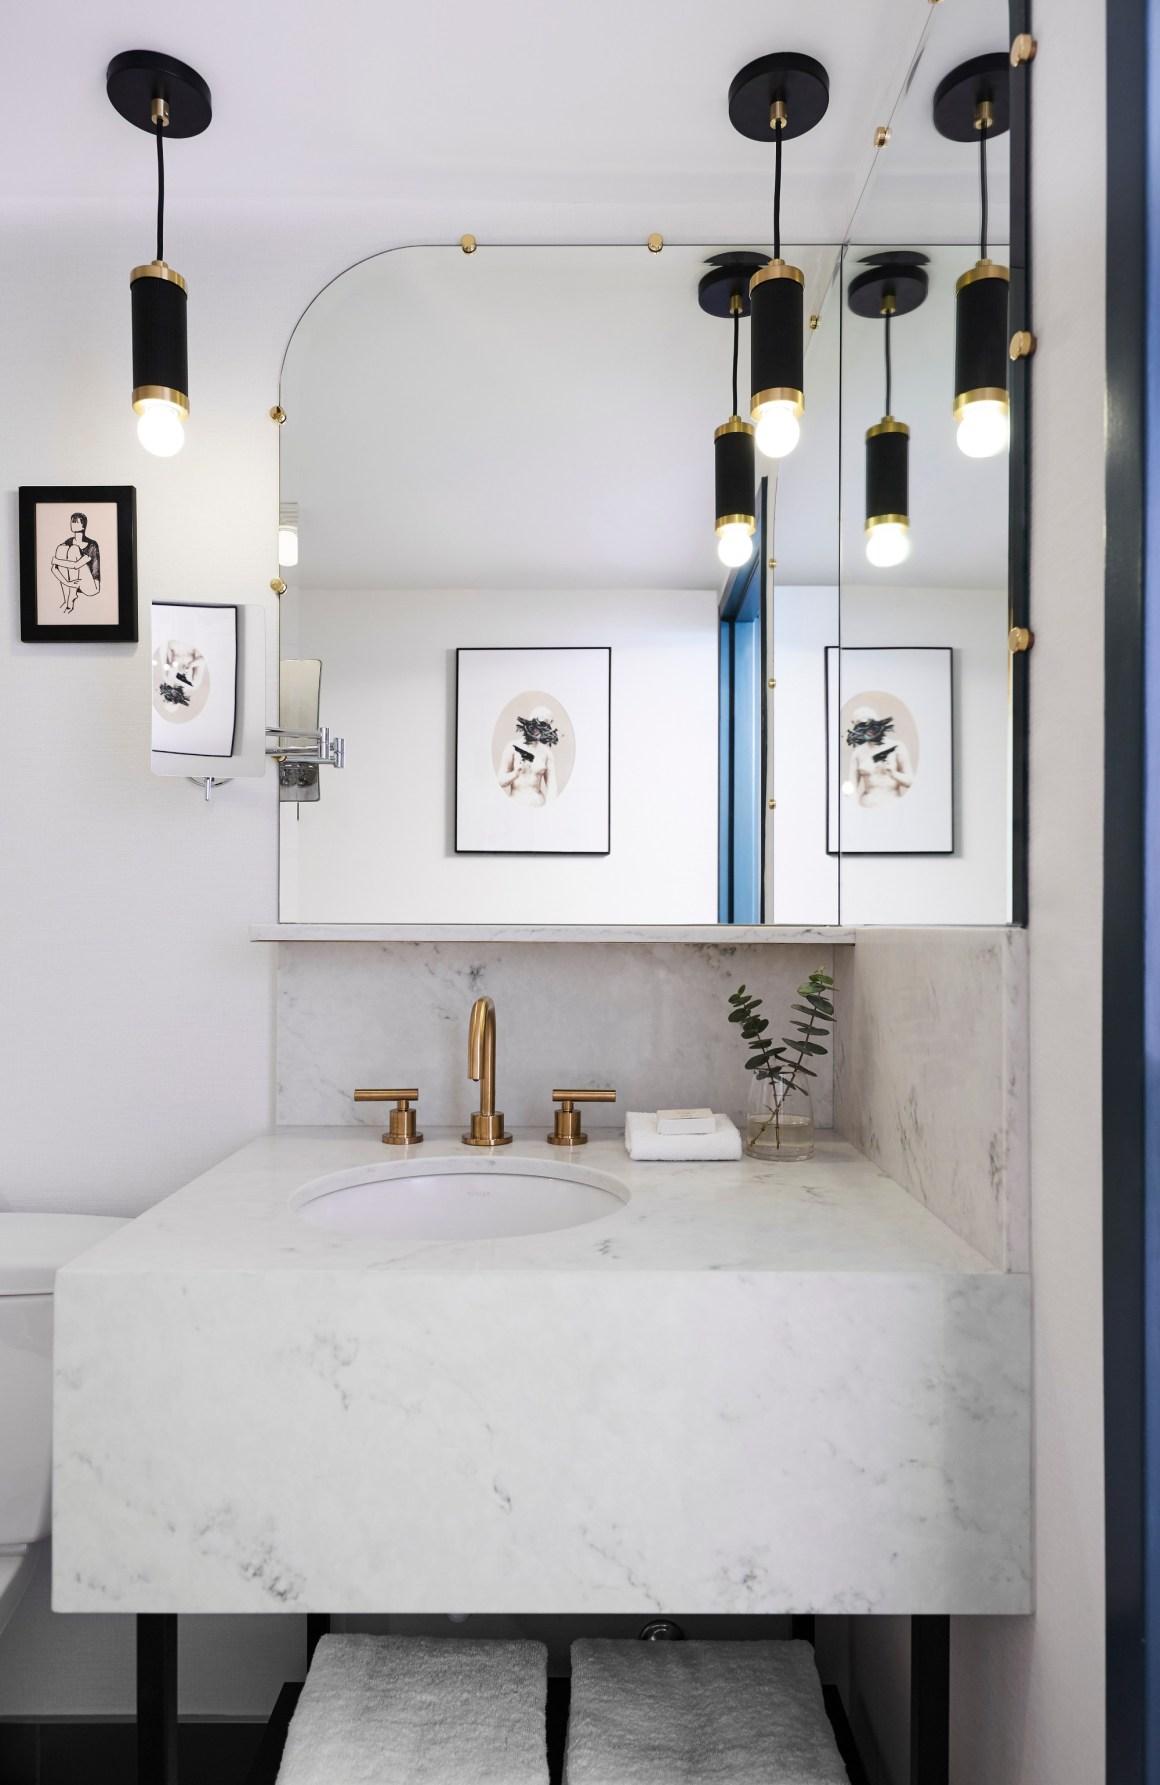 Kimpton Saint Geaorge Bathroom